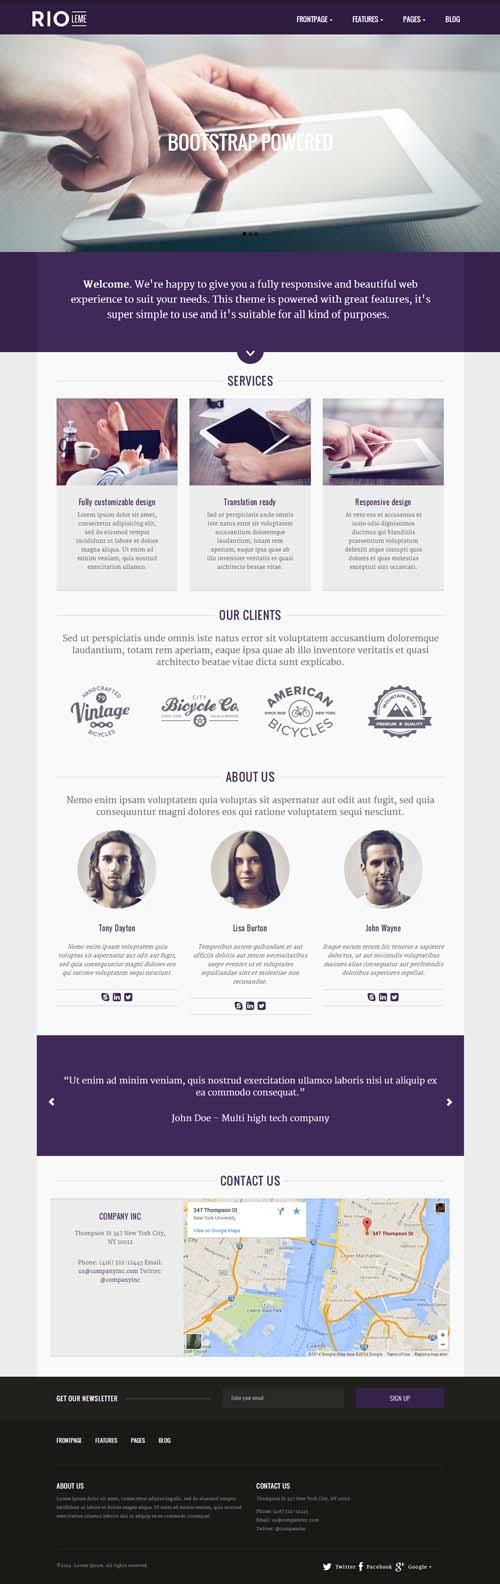 RioLeme - Responsive Multi-Purpose WordPress Theme